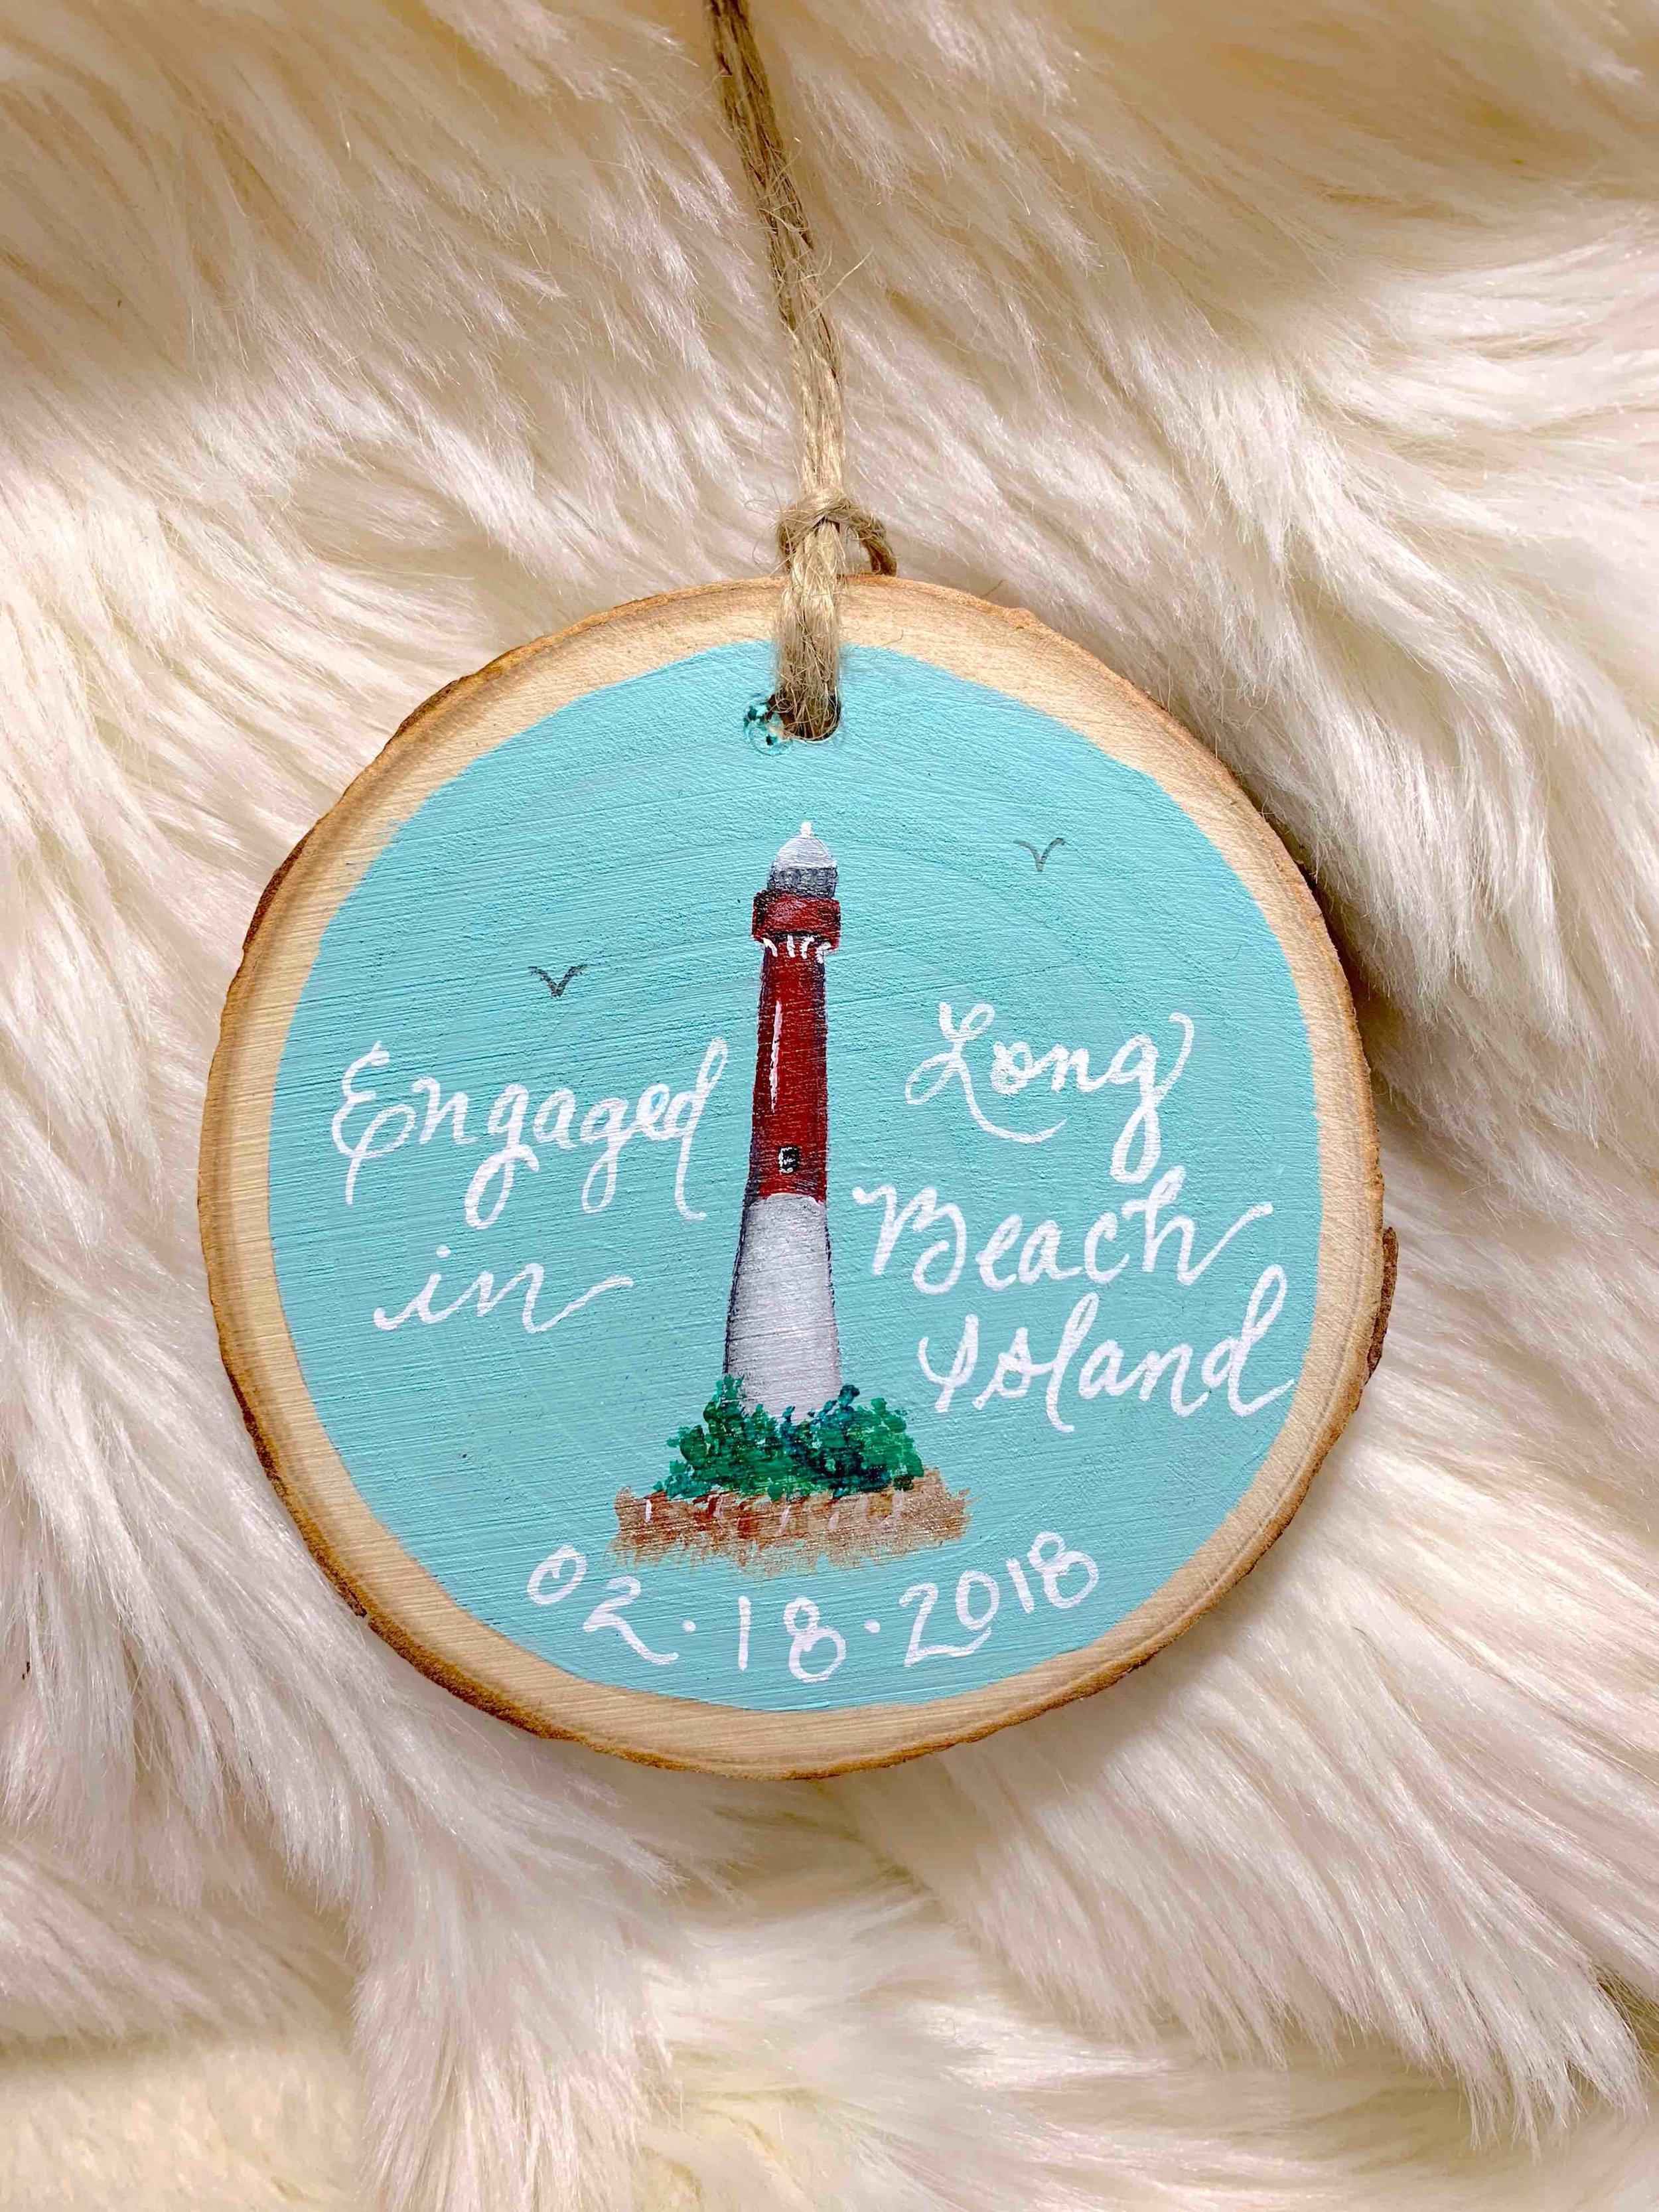 engaged in long beach island ornament.jpg